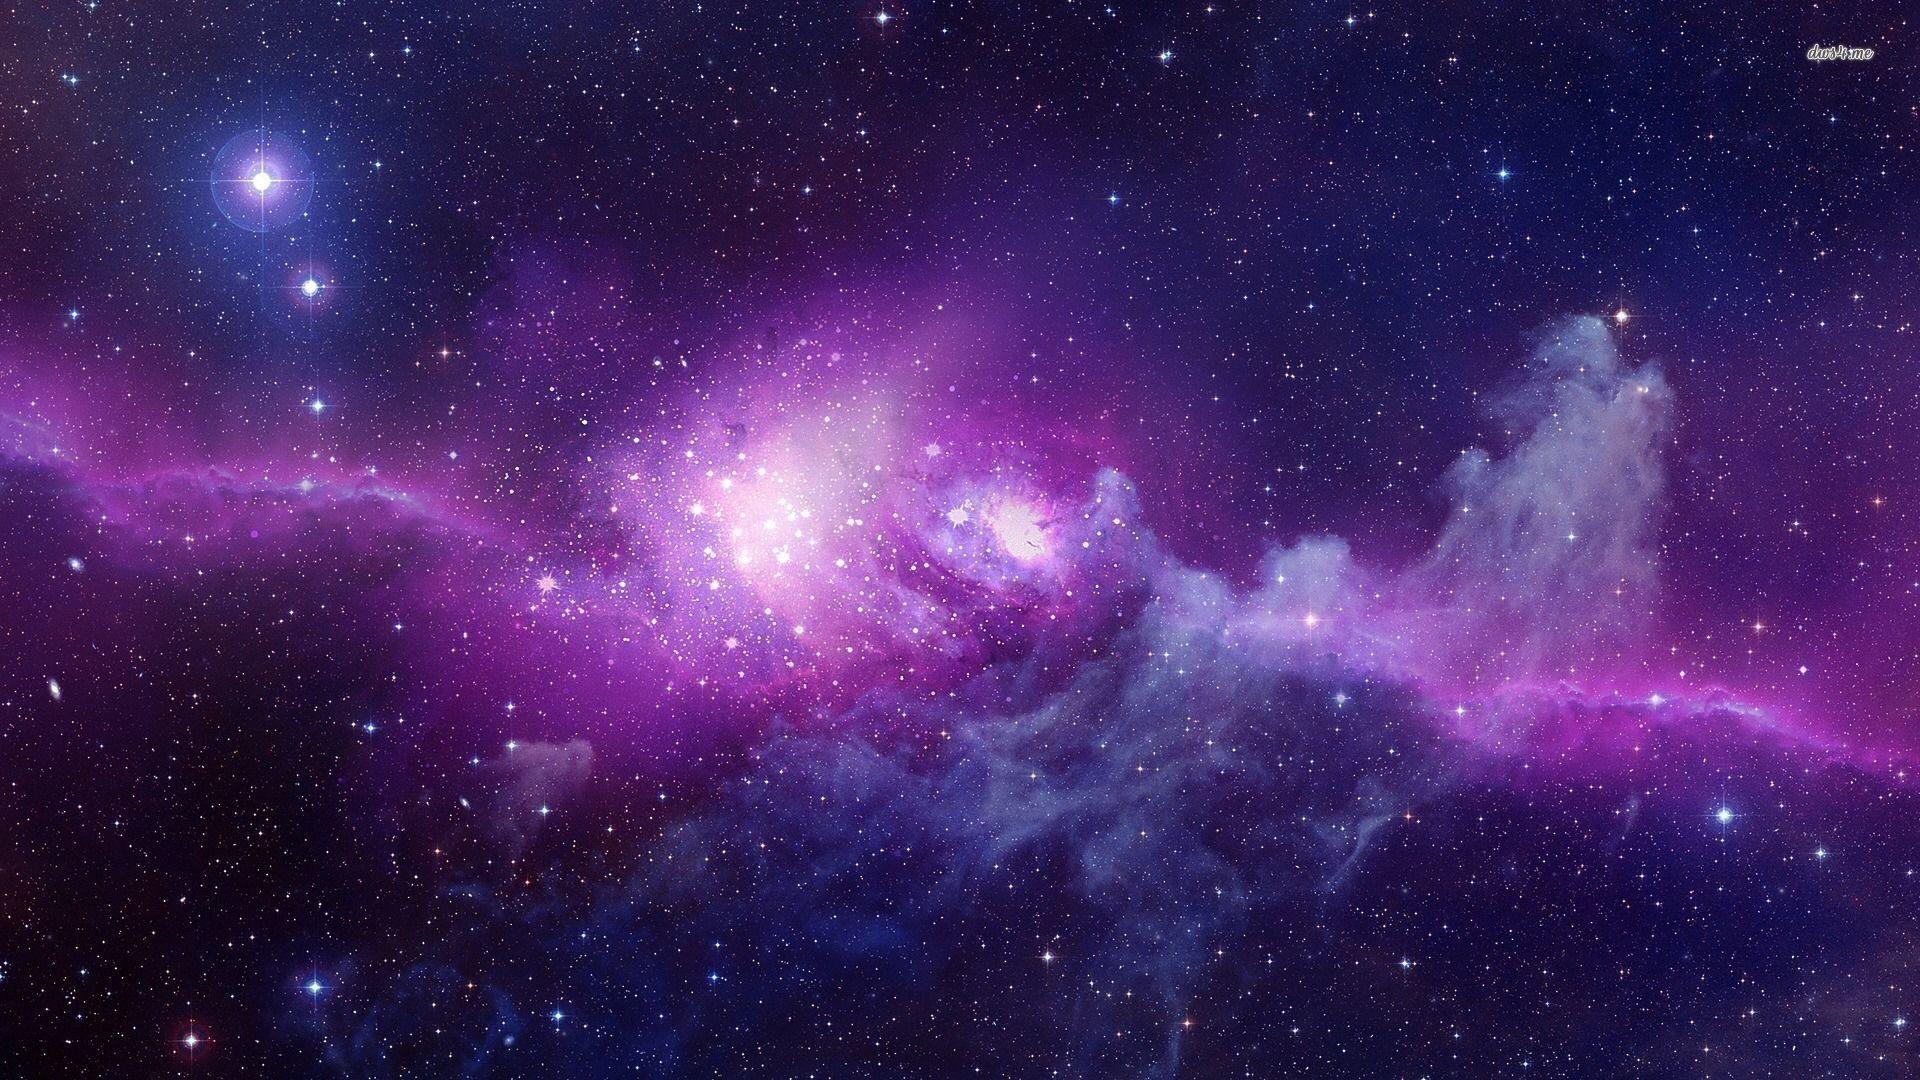 1920x1080 Purple Galaxy Wallpaper Phone Purple Galaxy Wallpaper Blue Galaxy Wallpaper Galaxy Background